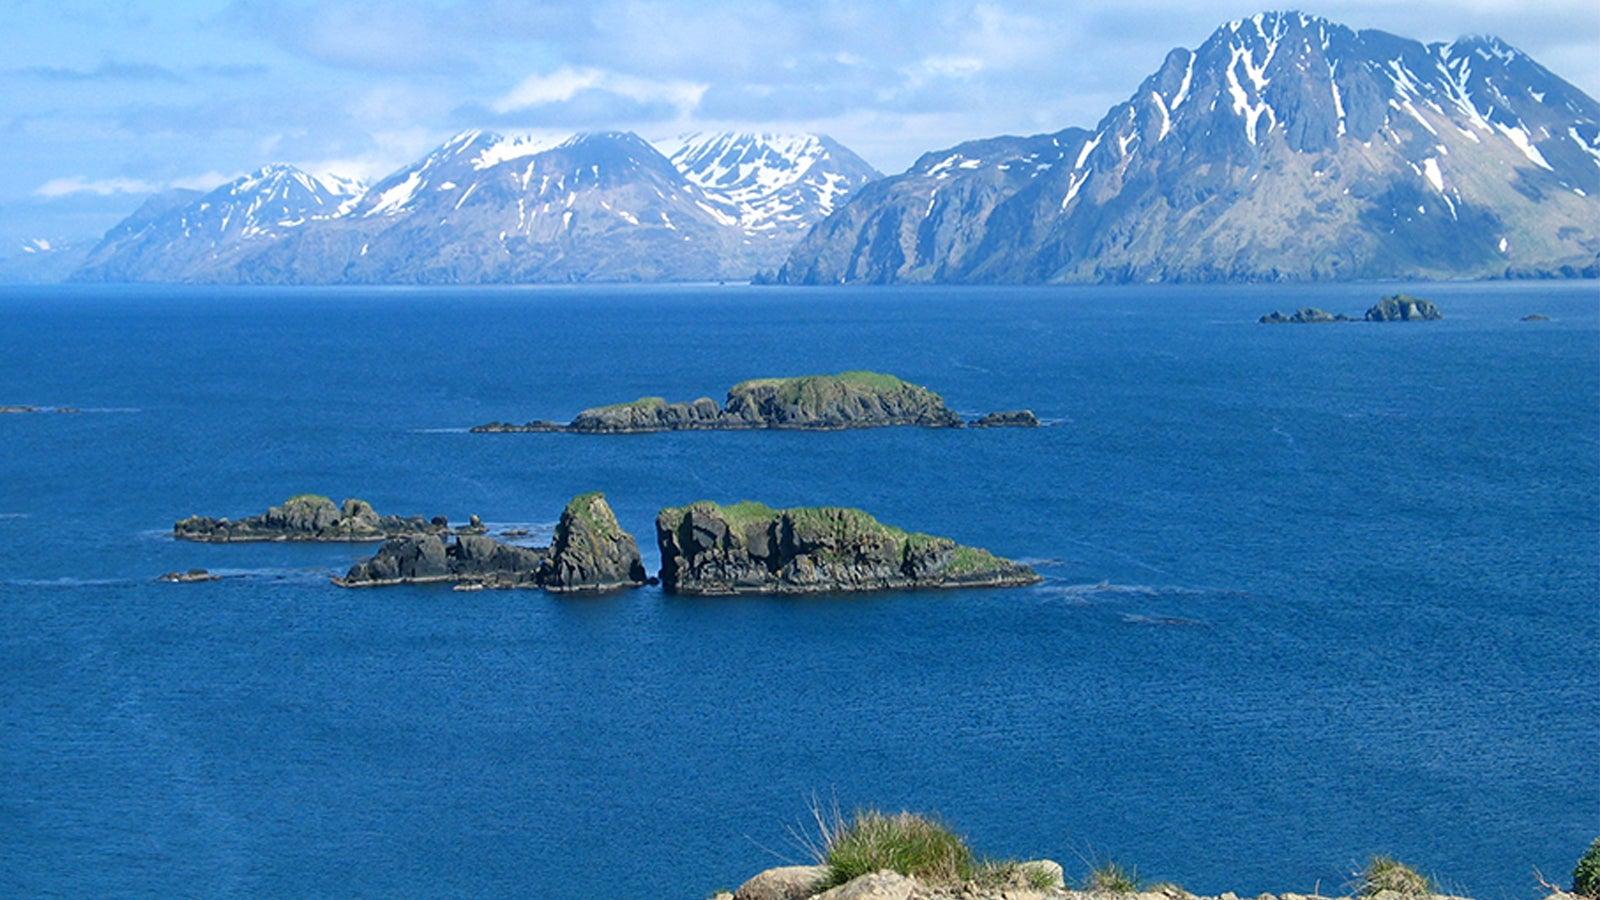 Das Beringmeer ist seit Anfang März fast eisfrei